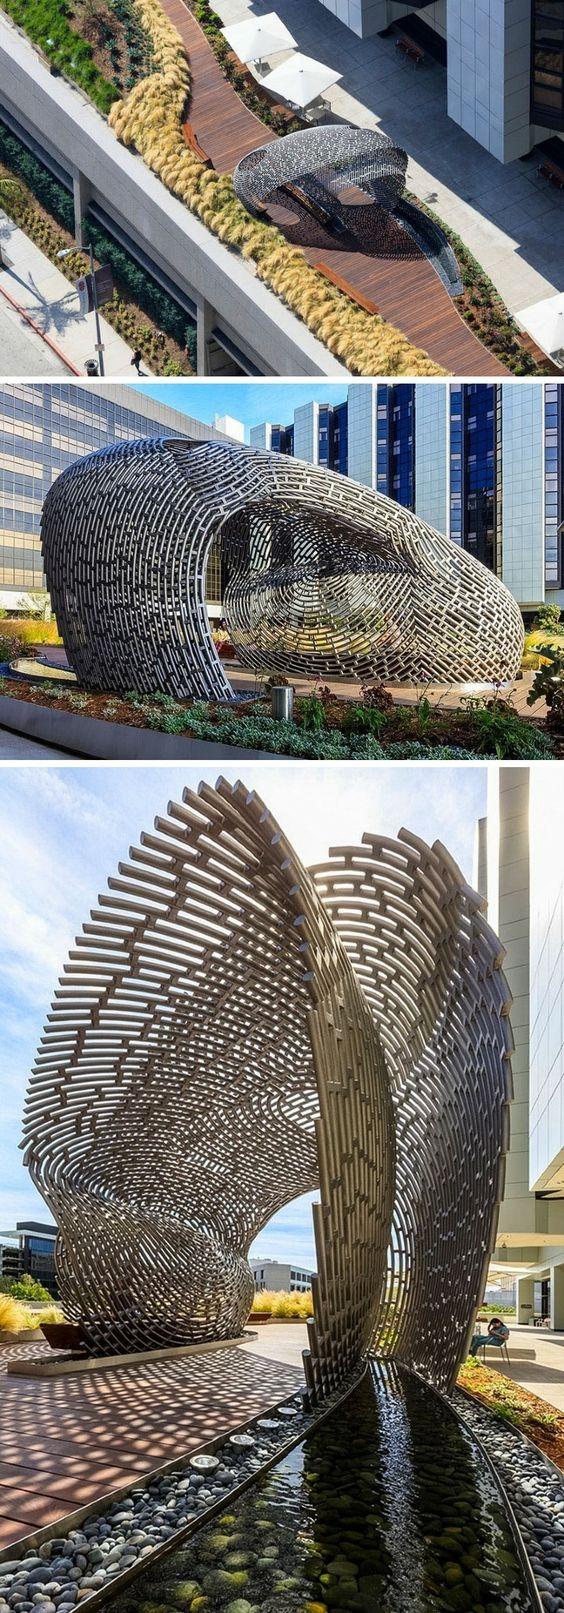 Sculptural pavilion in the Healing Garden